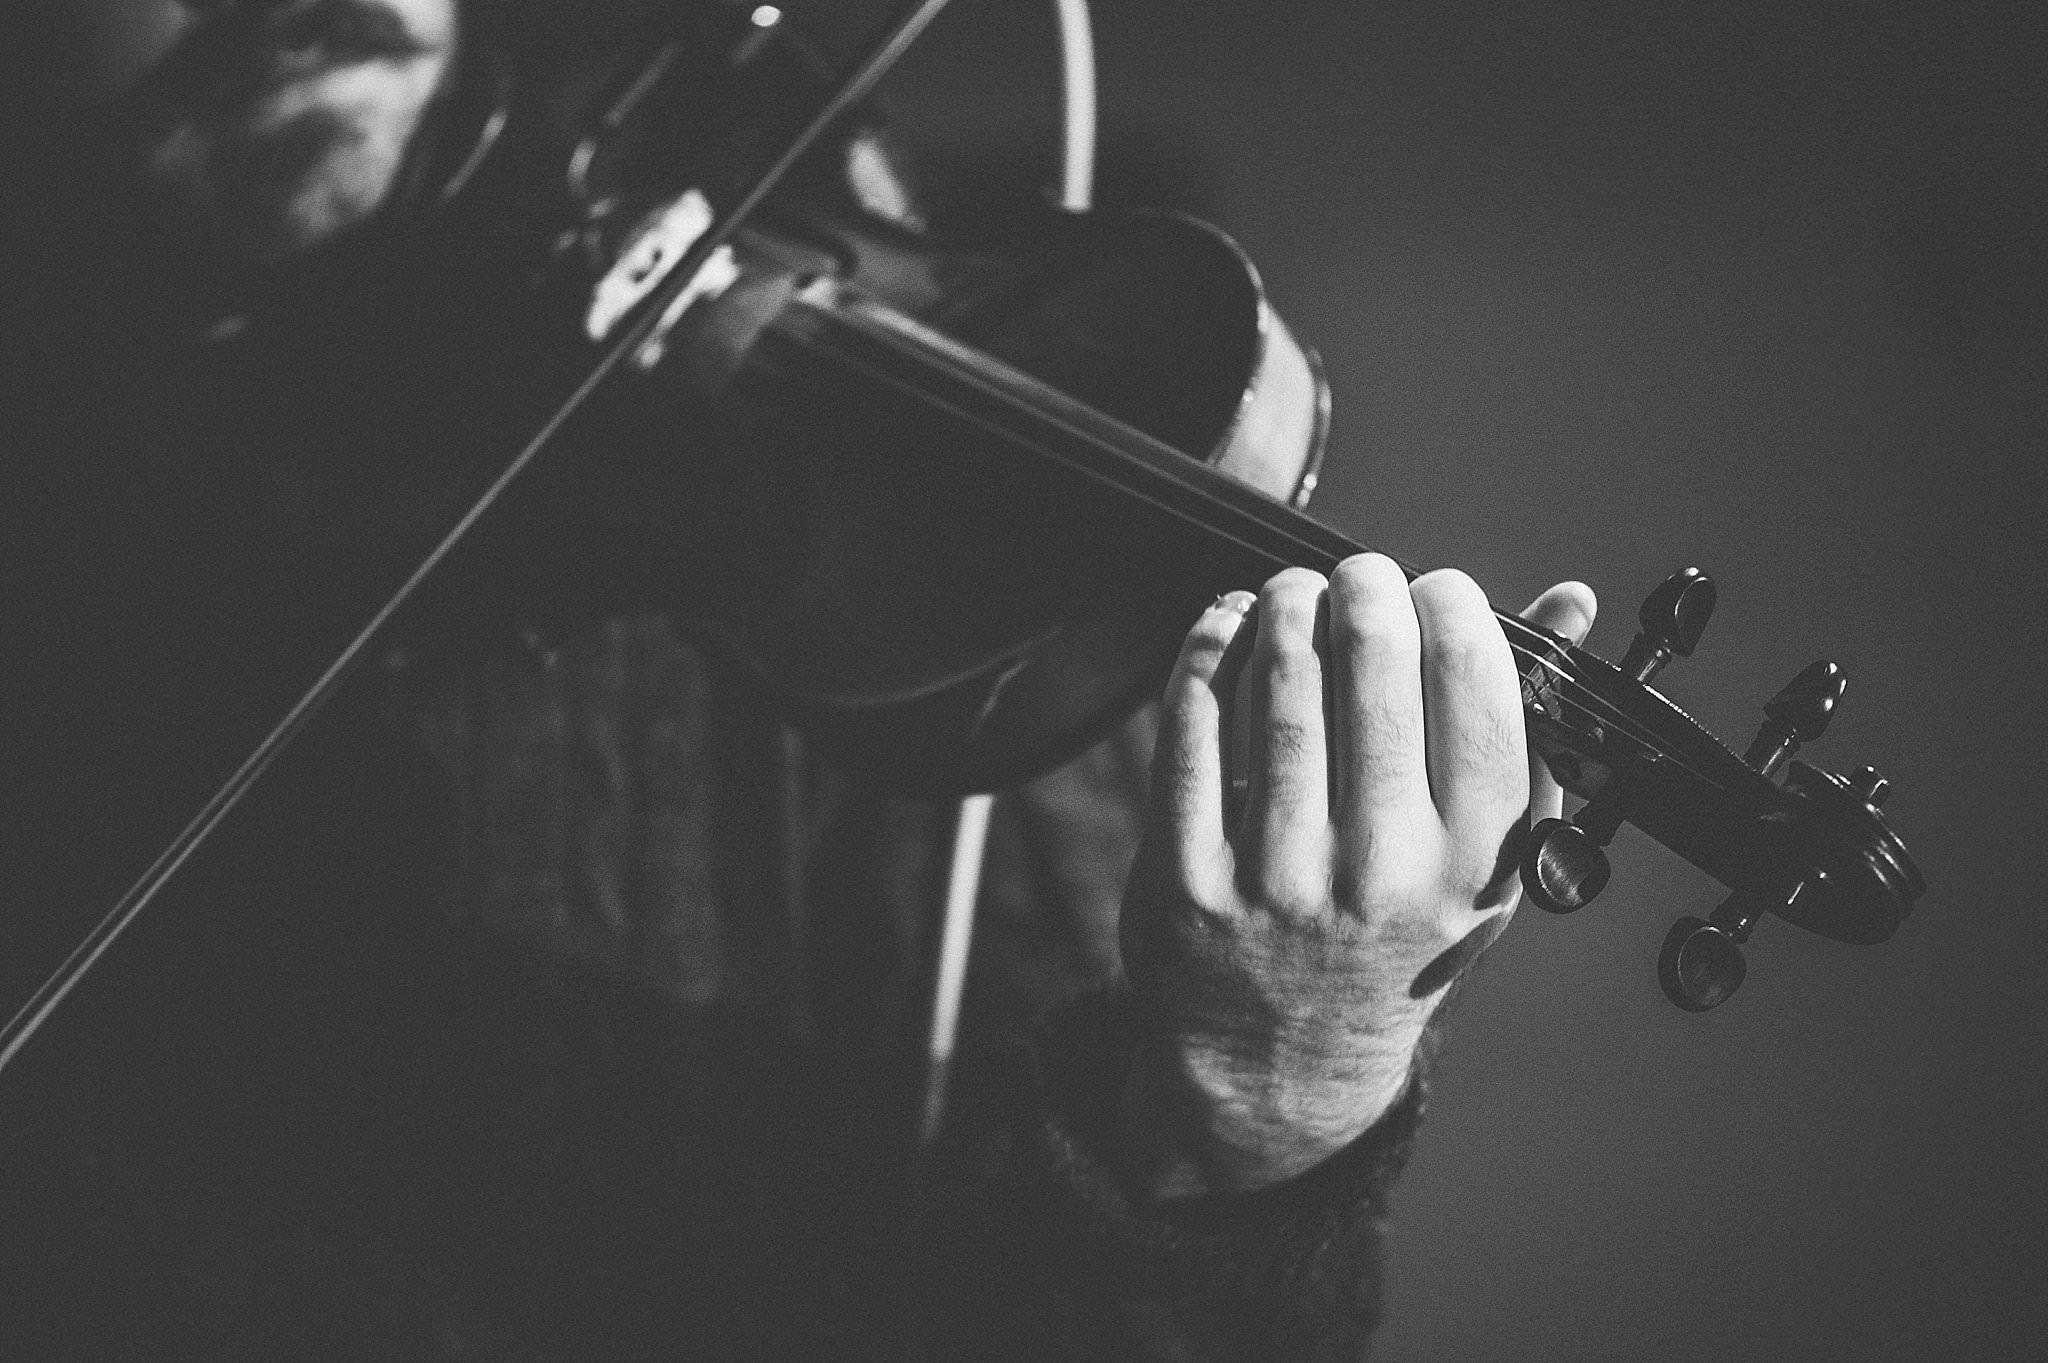 aga-tomaszek-music-photographer-cardiff_1381